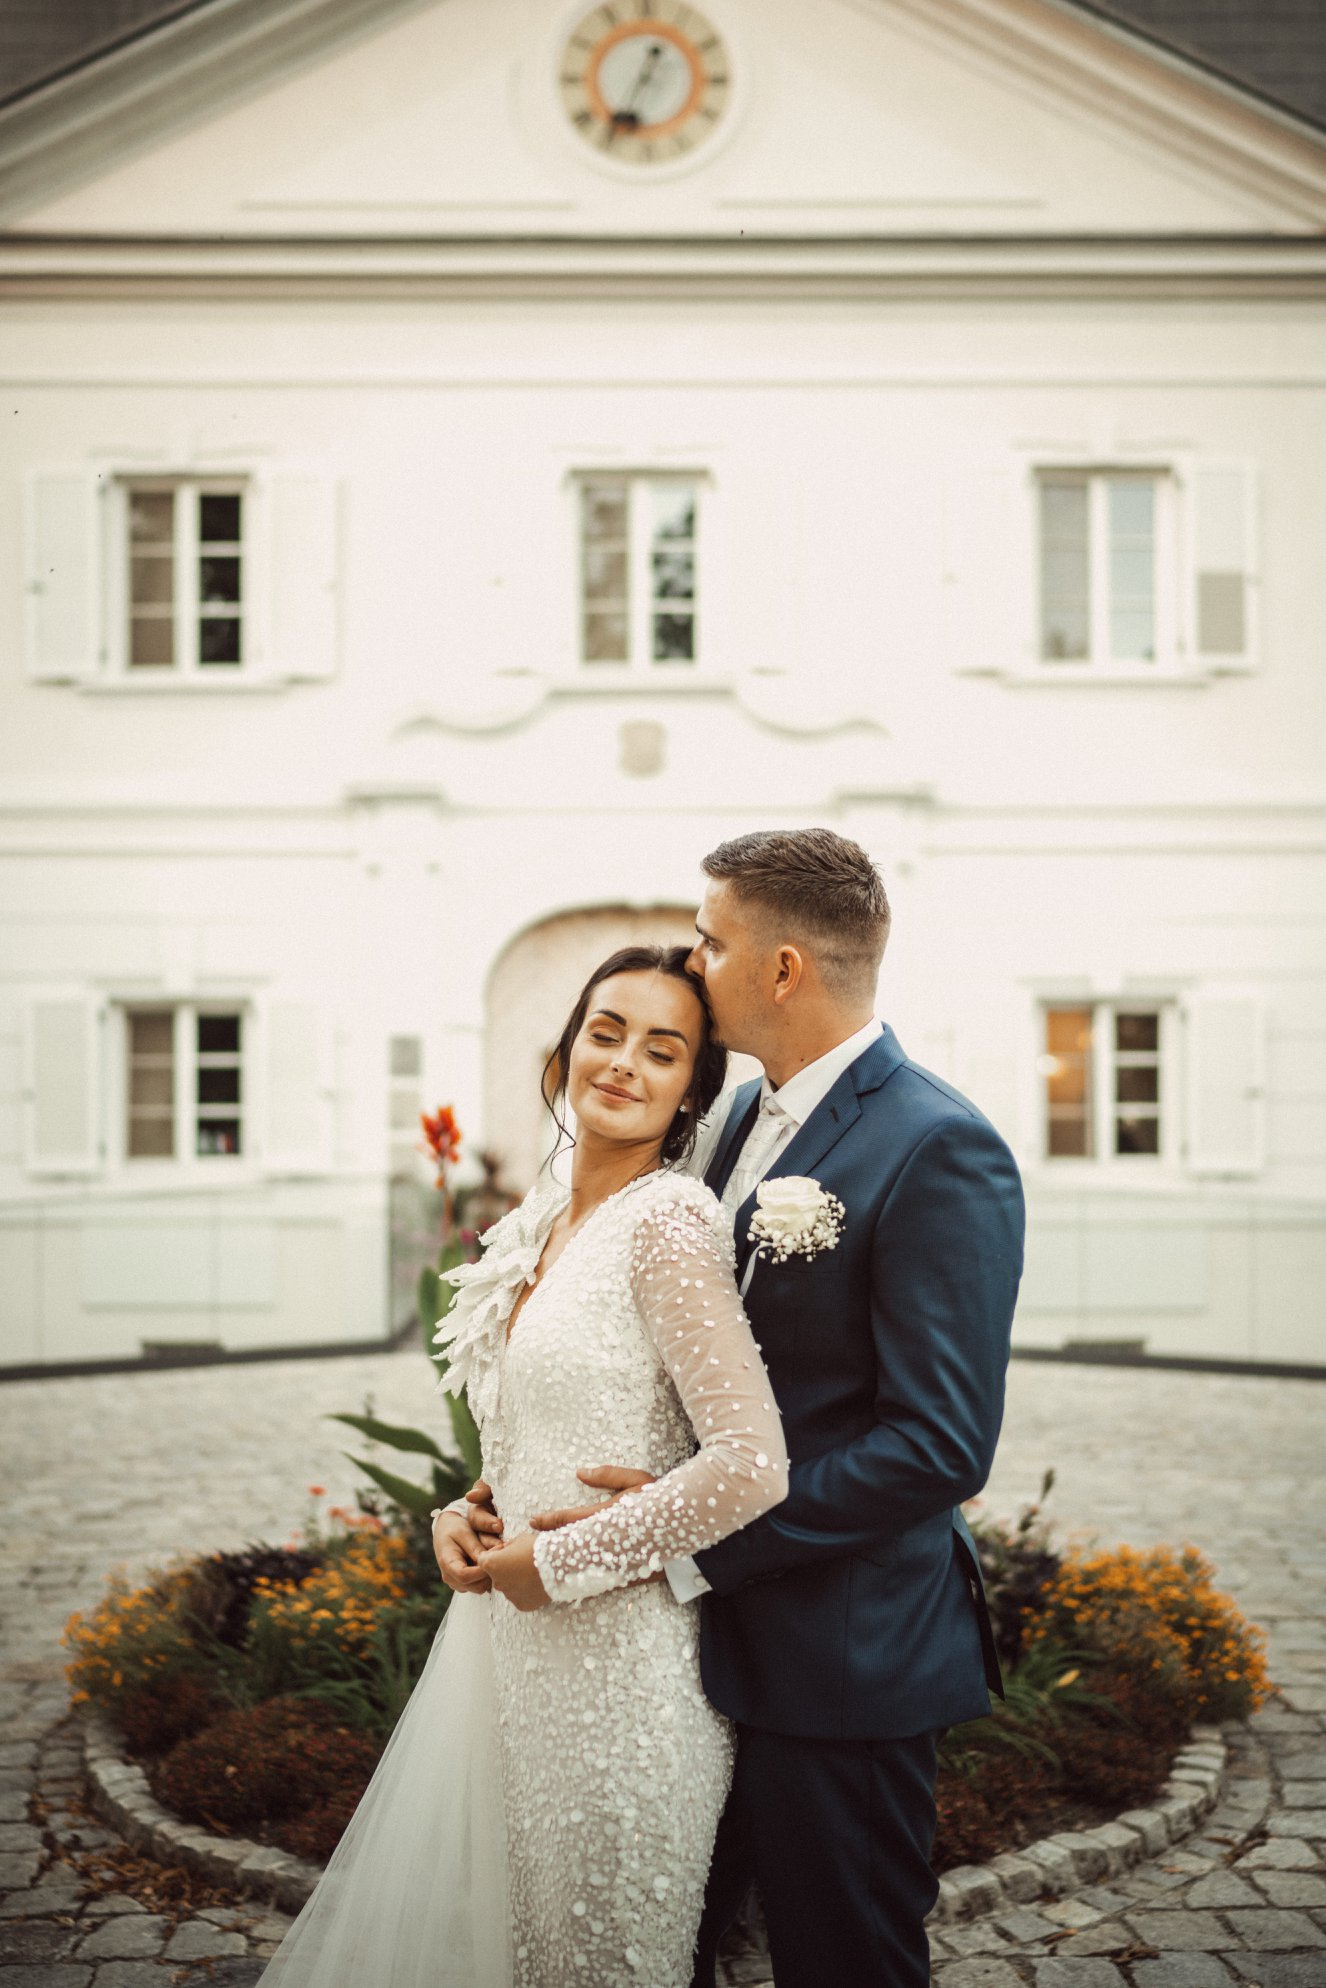 miesto-na-svadbu-zilinajpg